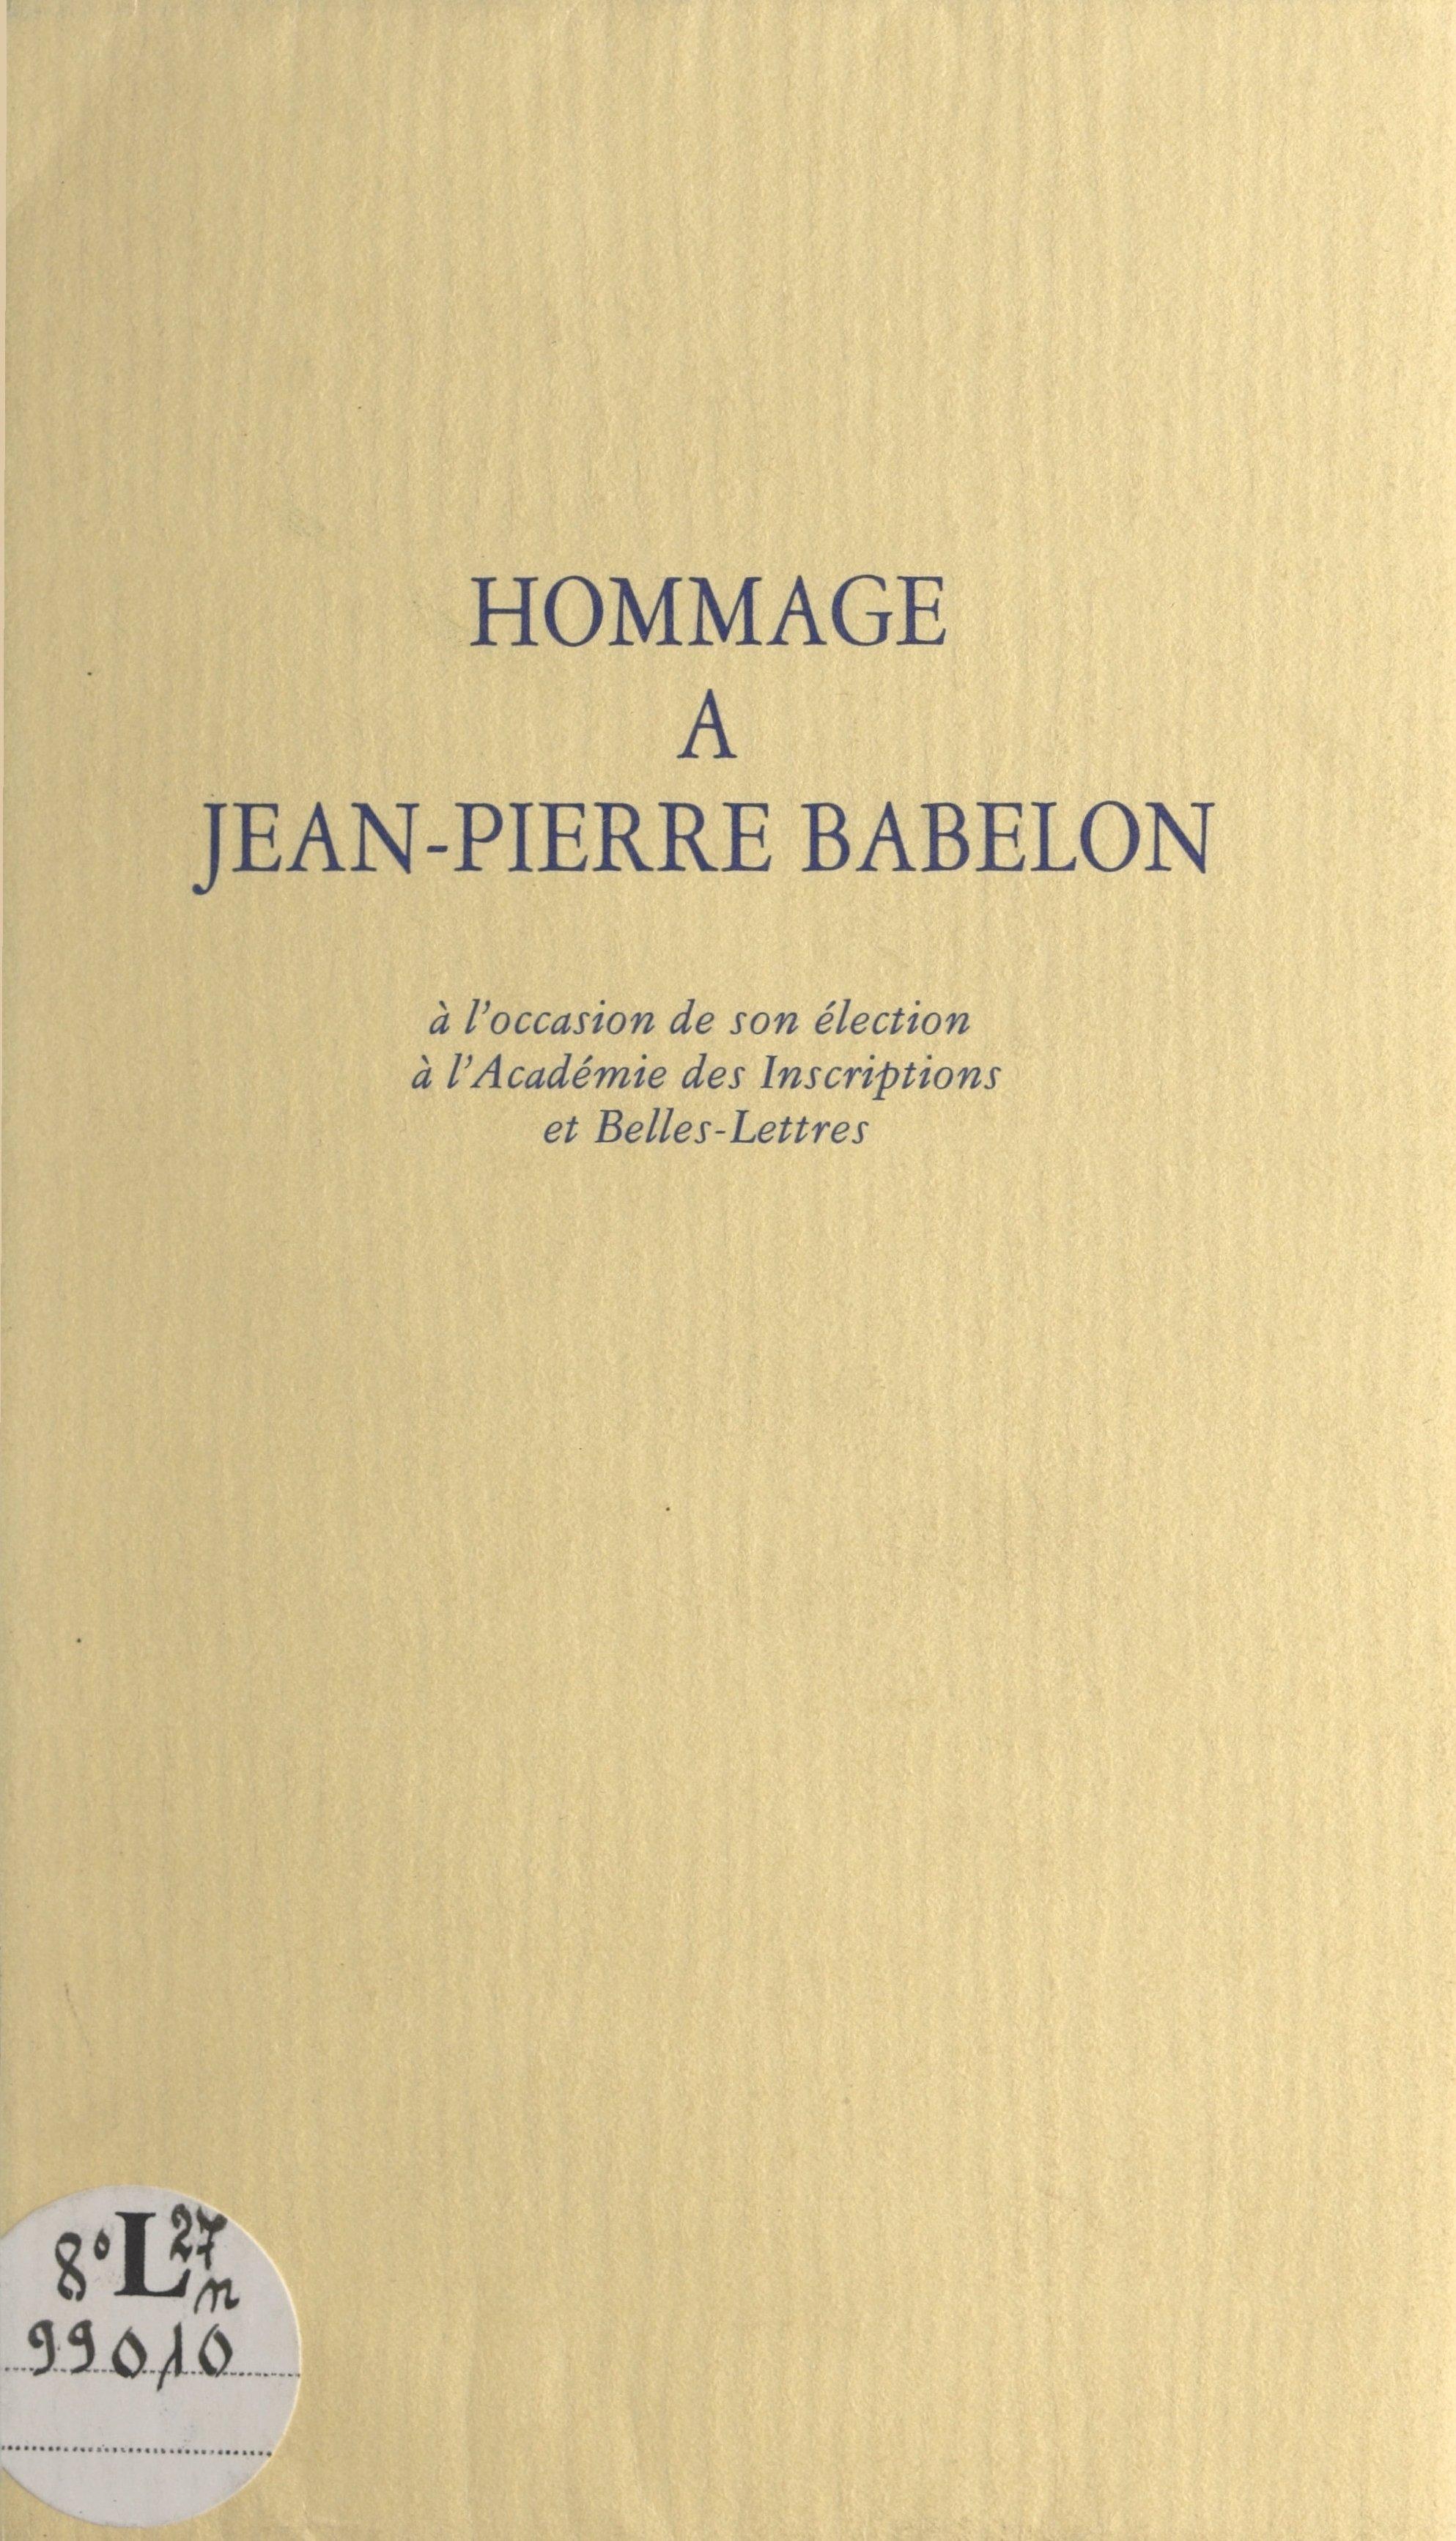 Hommage à Jean-Pierre Babel...